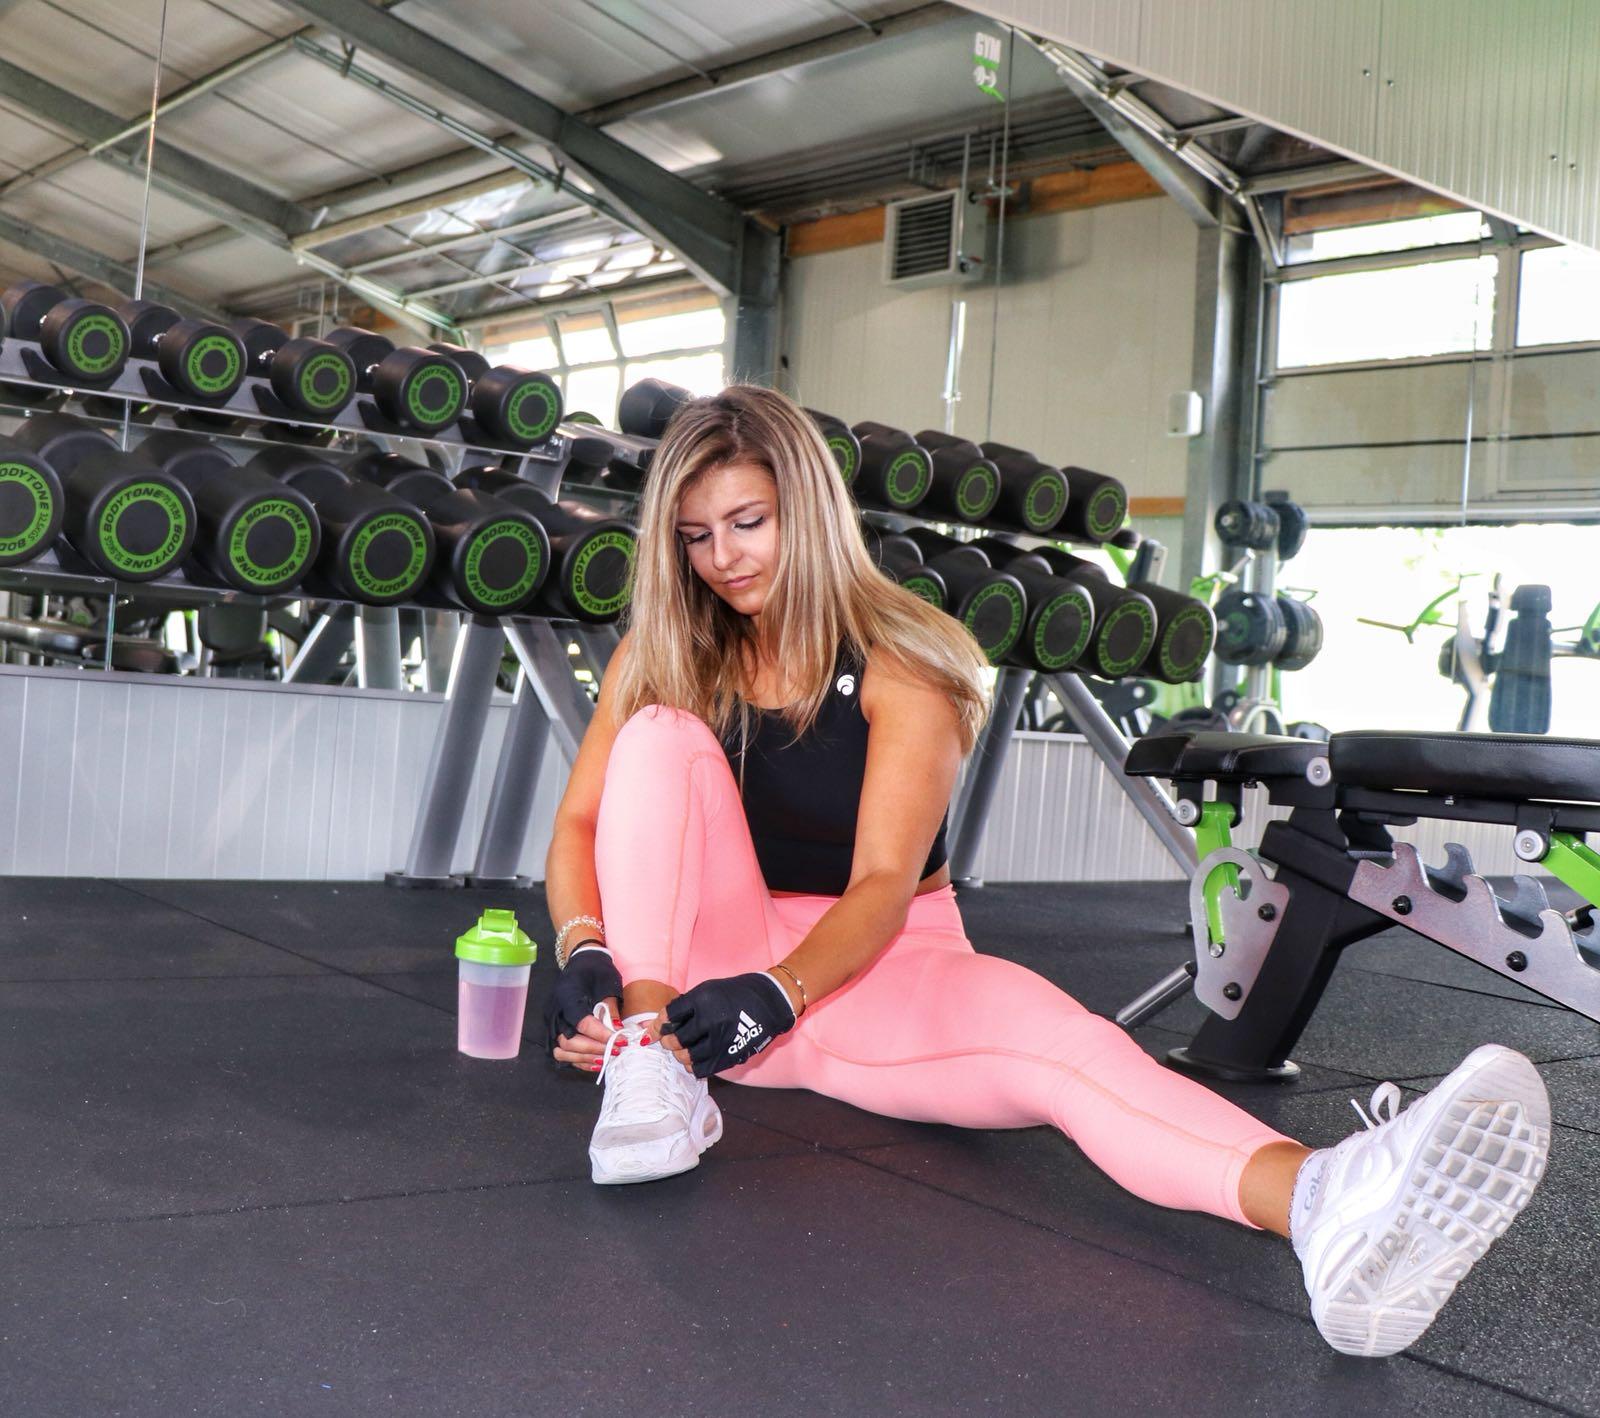 Semaine 5 : Votre full body Summer Programme : Avancé